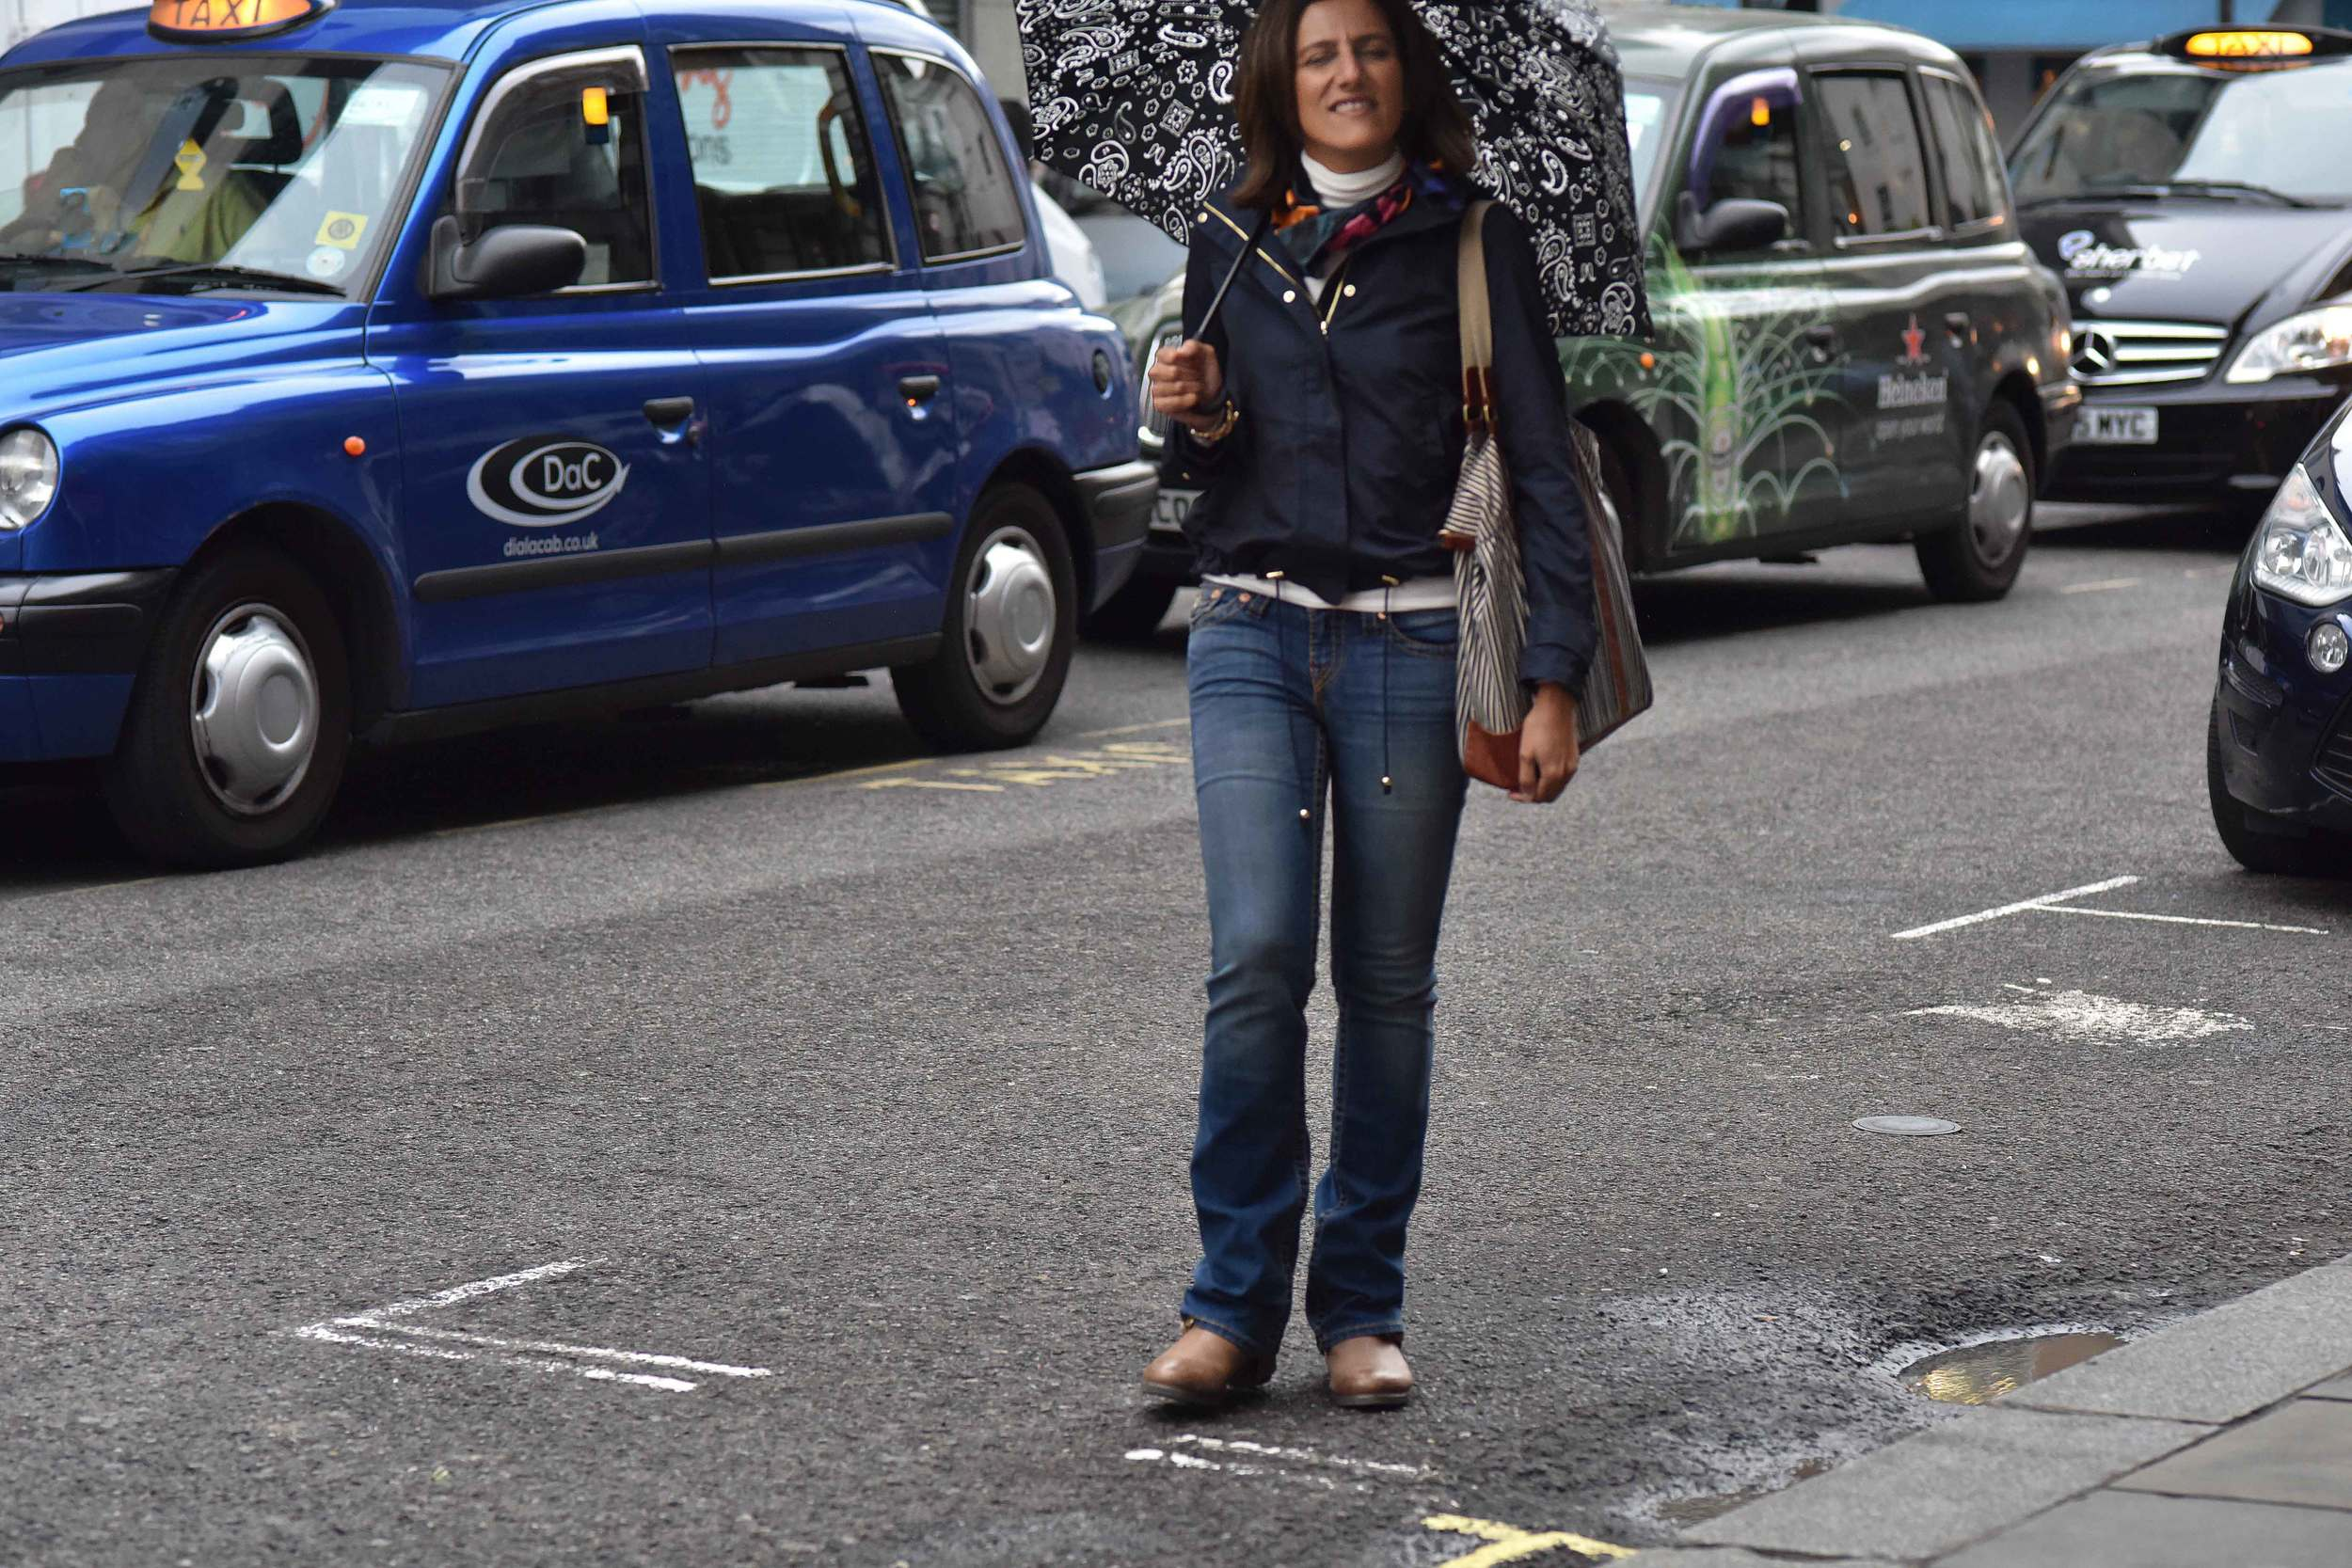 Zara water repellent jacket, Ralph Lauren polo sweater, Zara printed pocket square, Zara bandana print umbrella, True Religion jeans, Uggs boots, in front of London cabs, Covent Garden, London, UK. Image©sourcingstyle.com